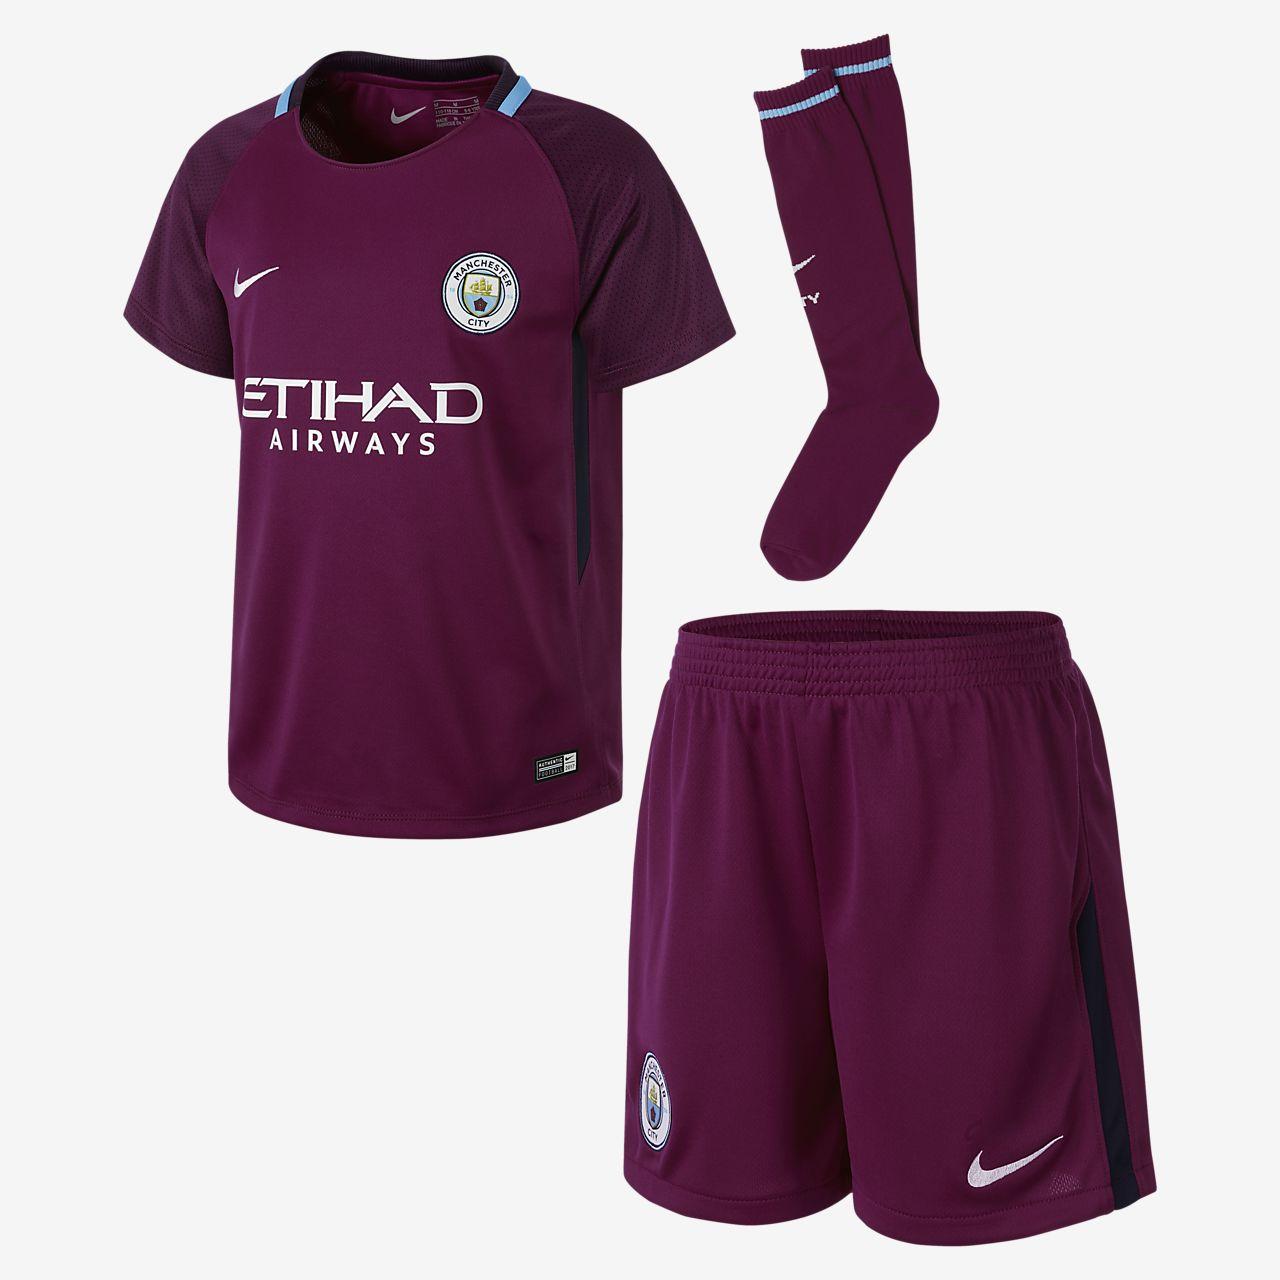 ... 2017/18 Manchester City FC Stadium Away Younger Kids' Football Kit